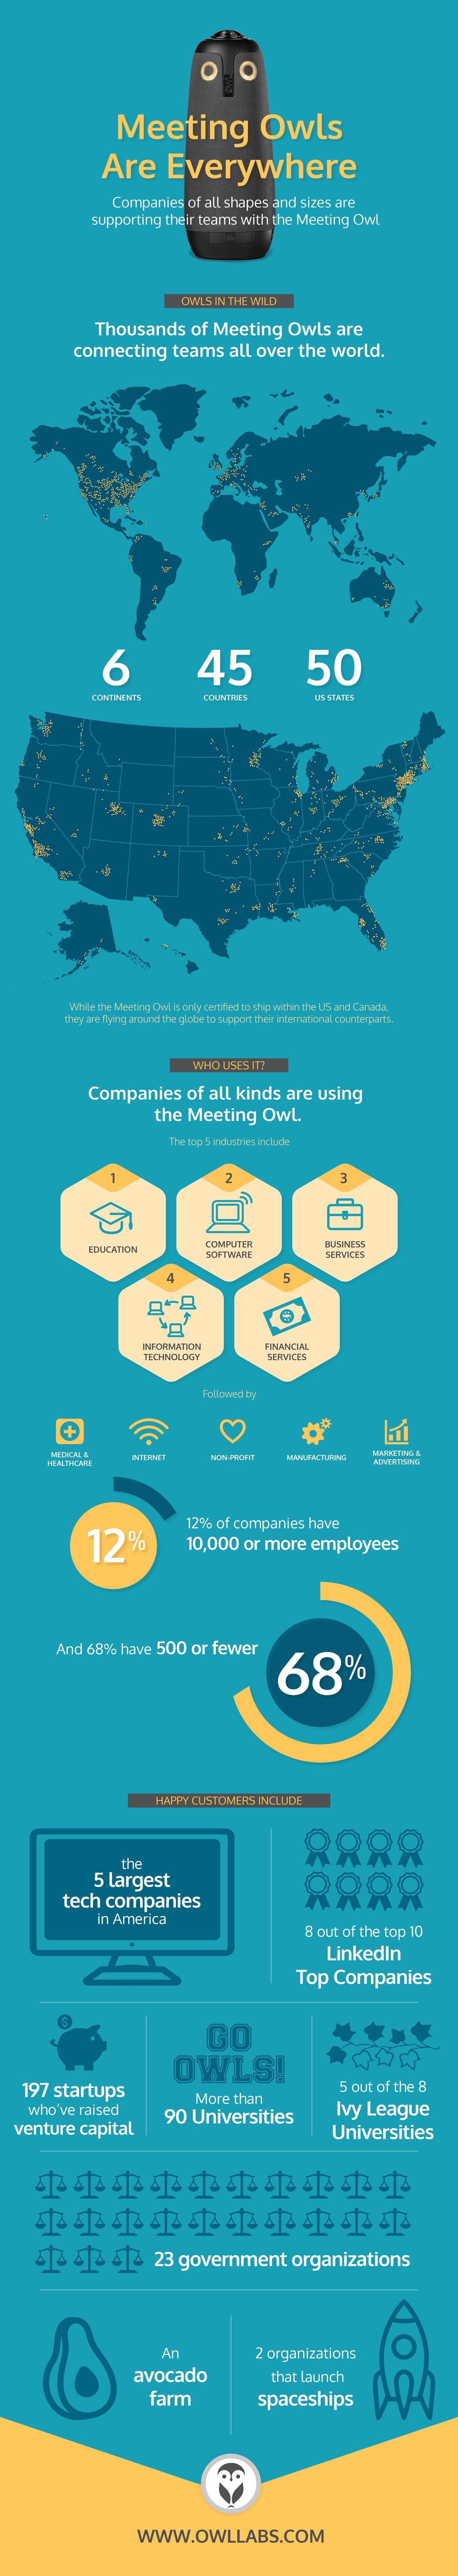 MOnak_MeetingOwl_Project3_Infographic_FINAL_web